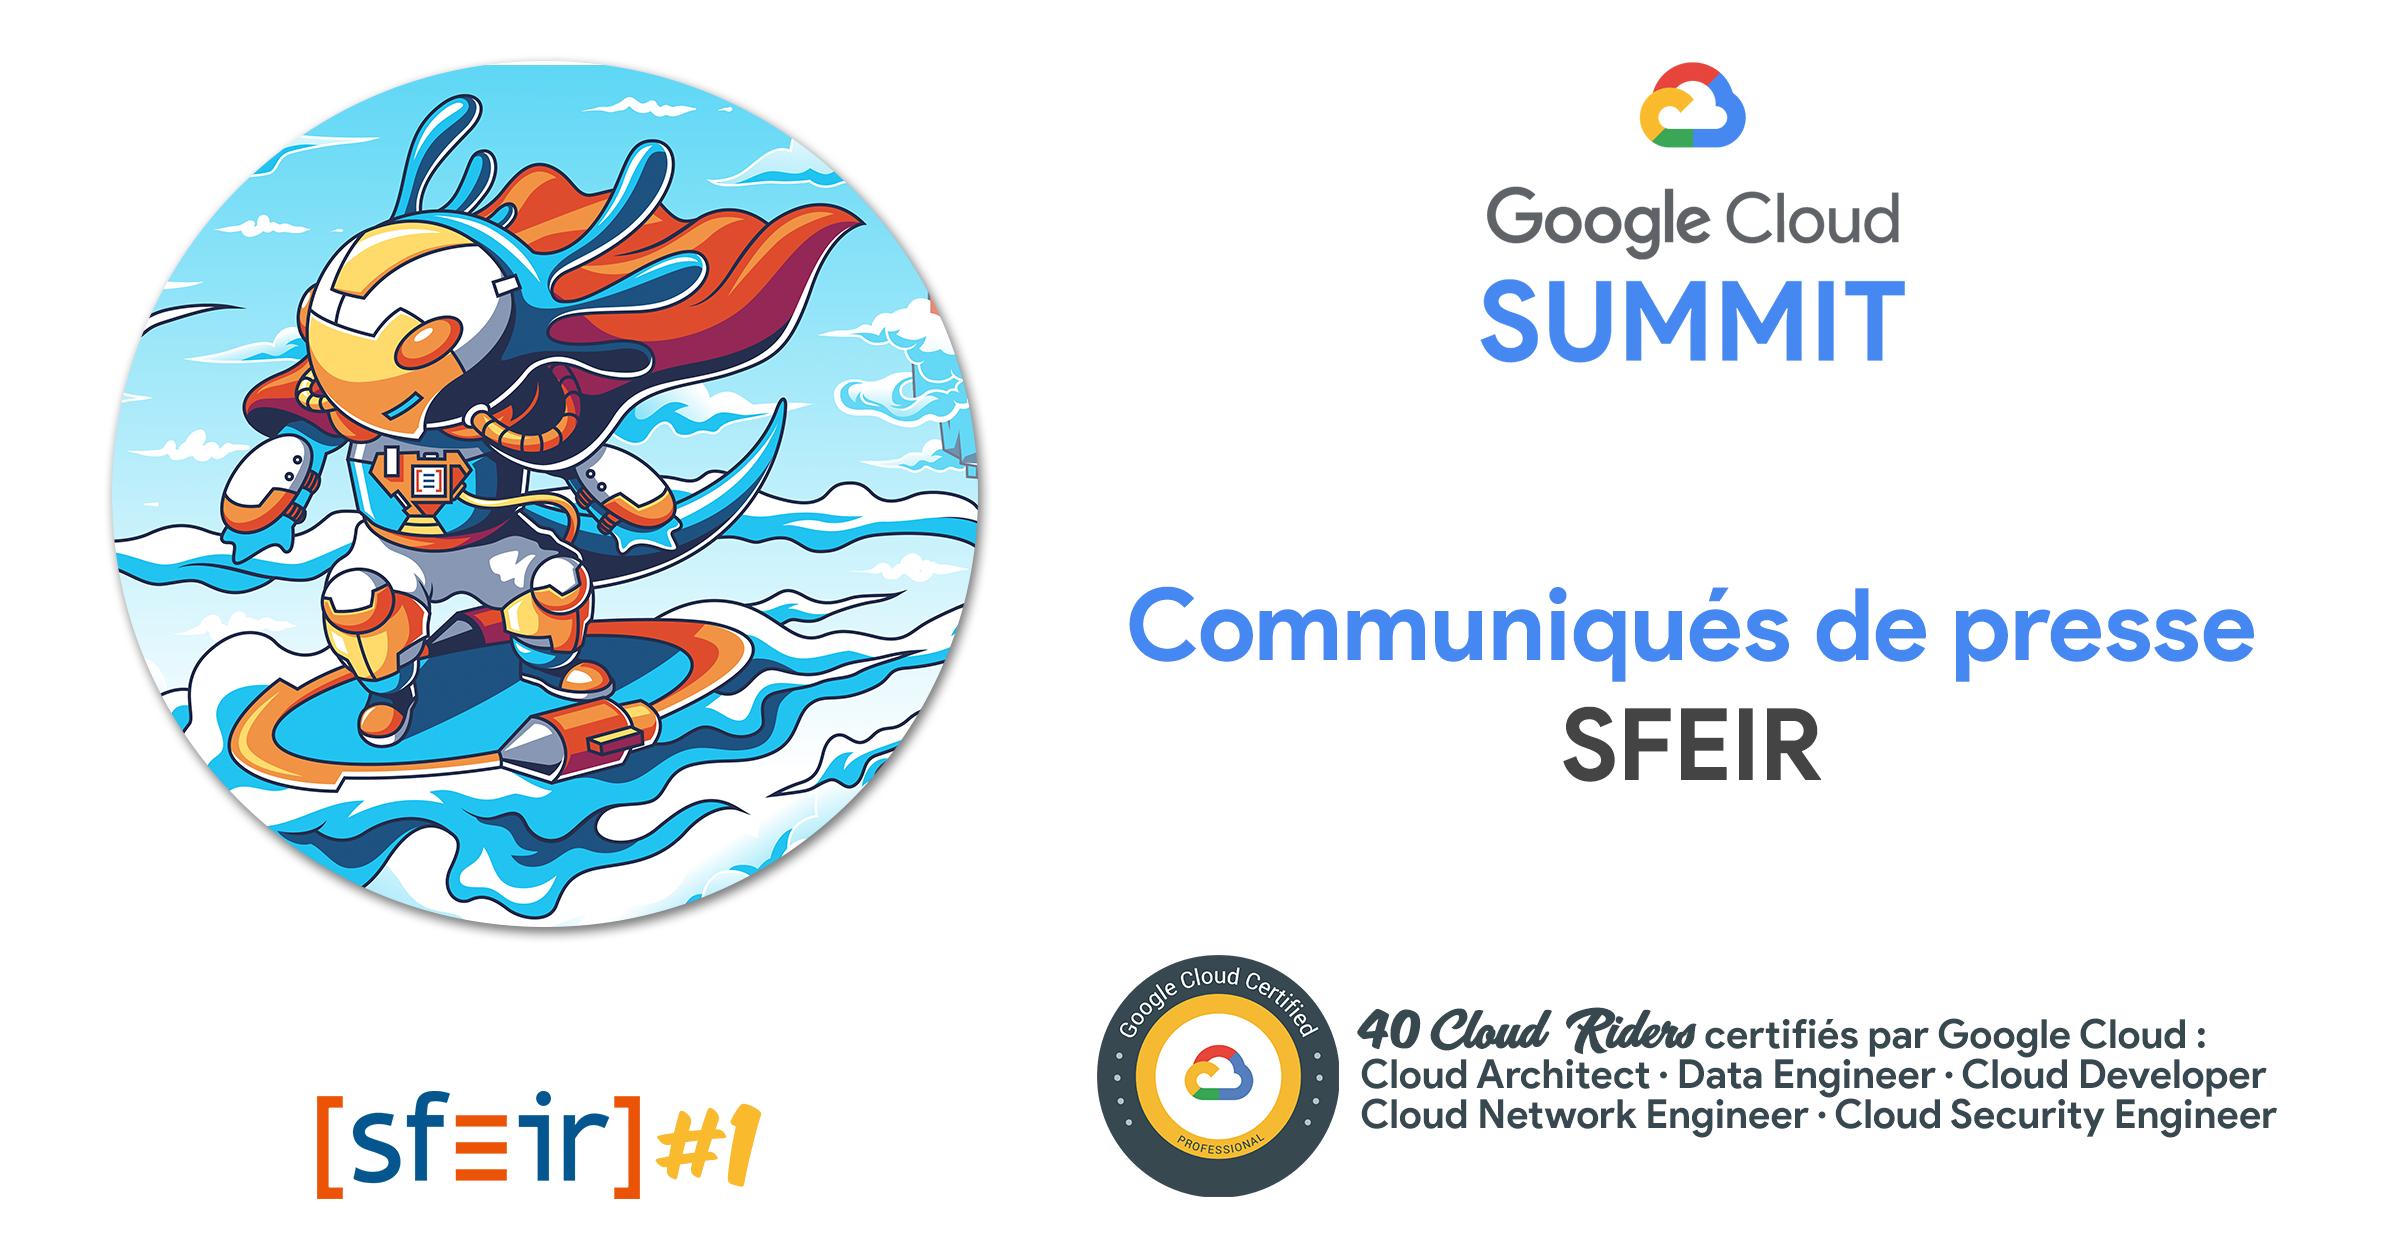 Communiqués de presse SFEIR - Google Cloud Summit 2019